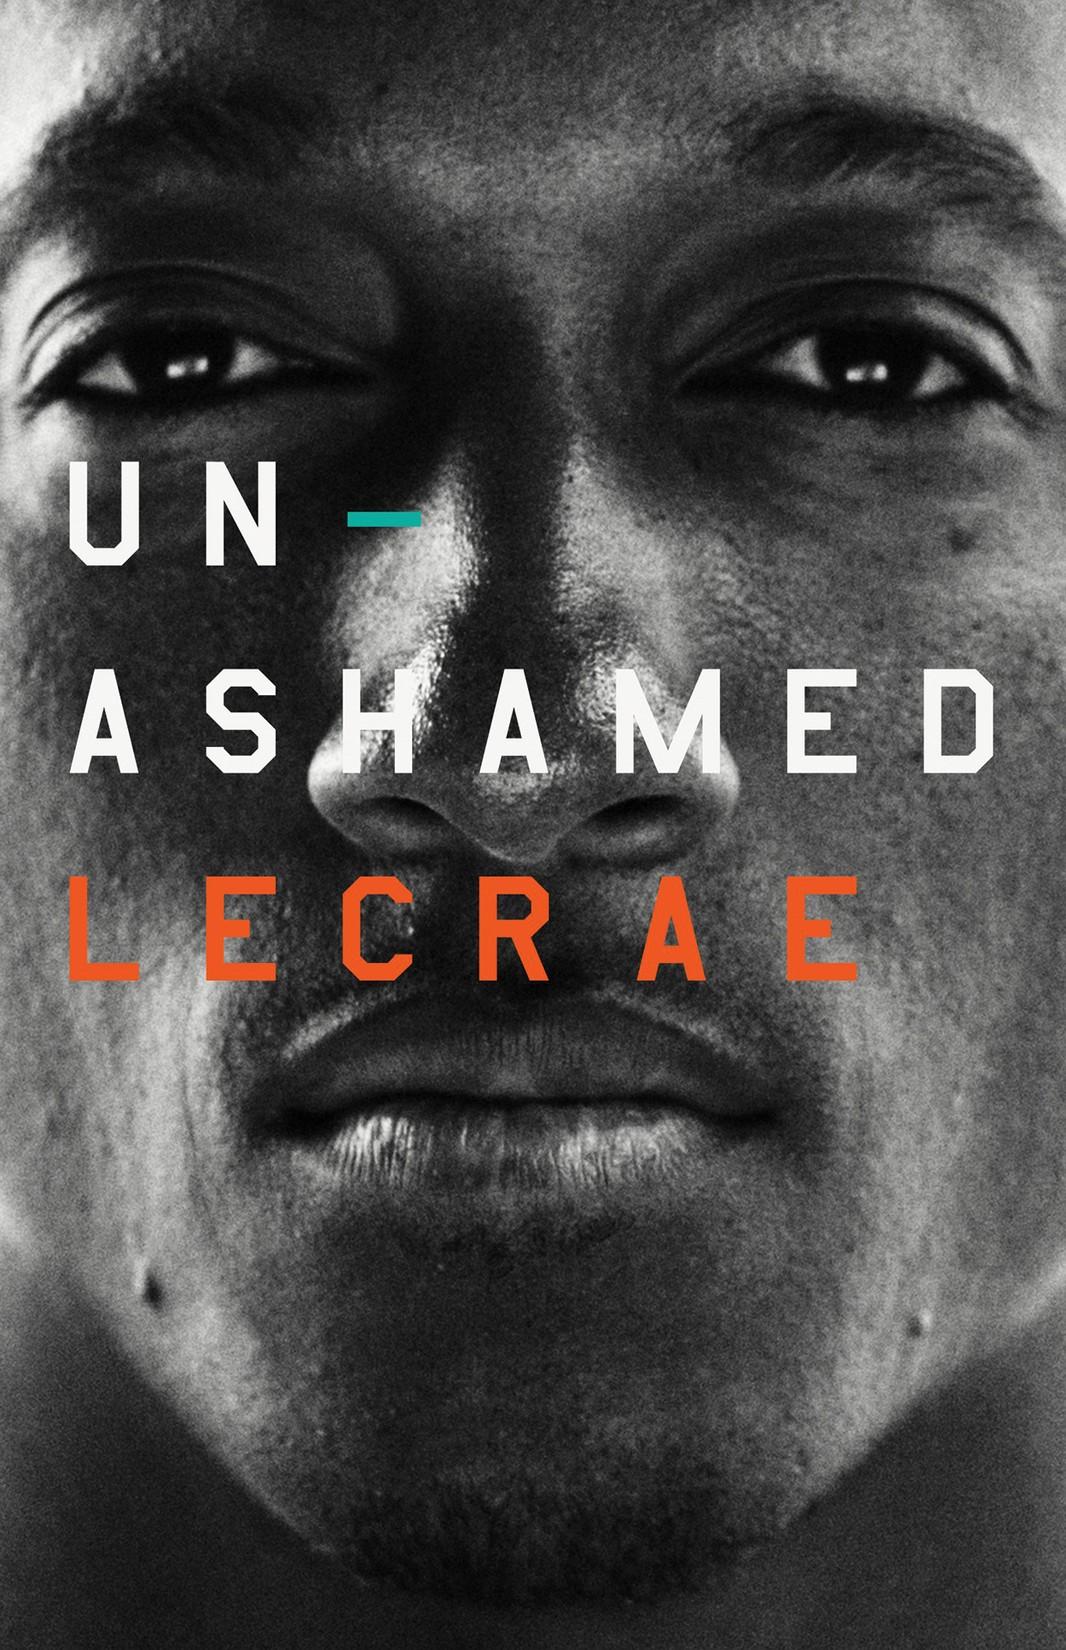 'Unashamed' by Lecrae